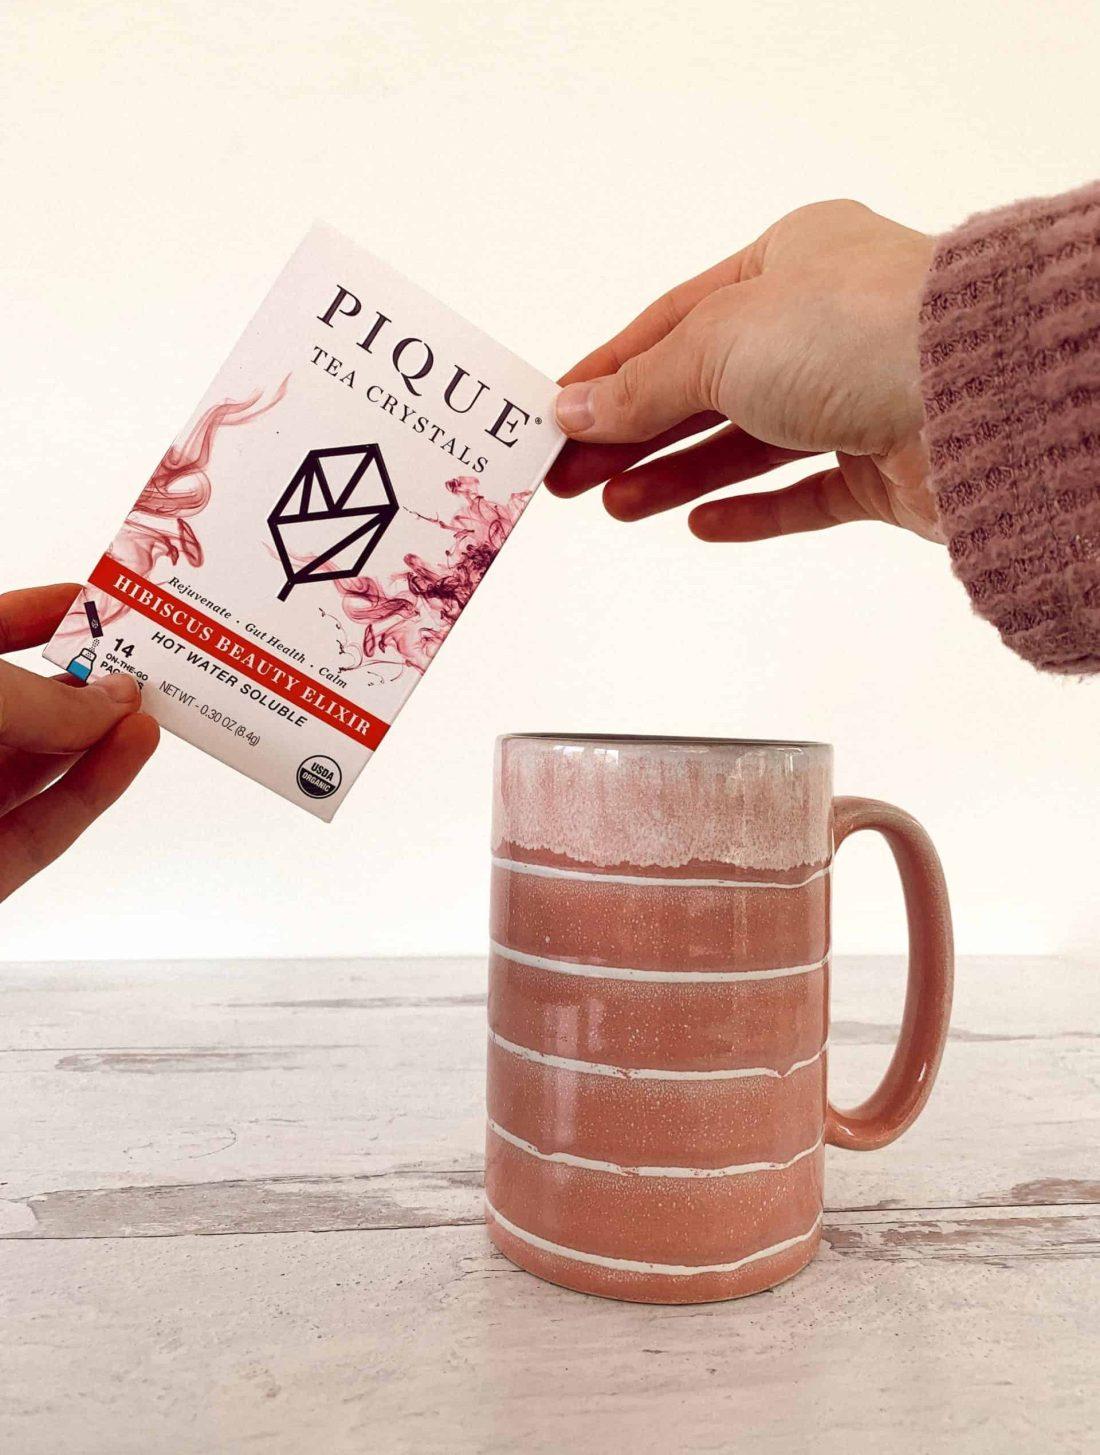 Holding up the Pique Tea Crystals box next to my mug.